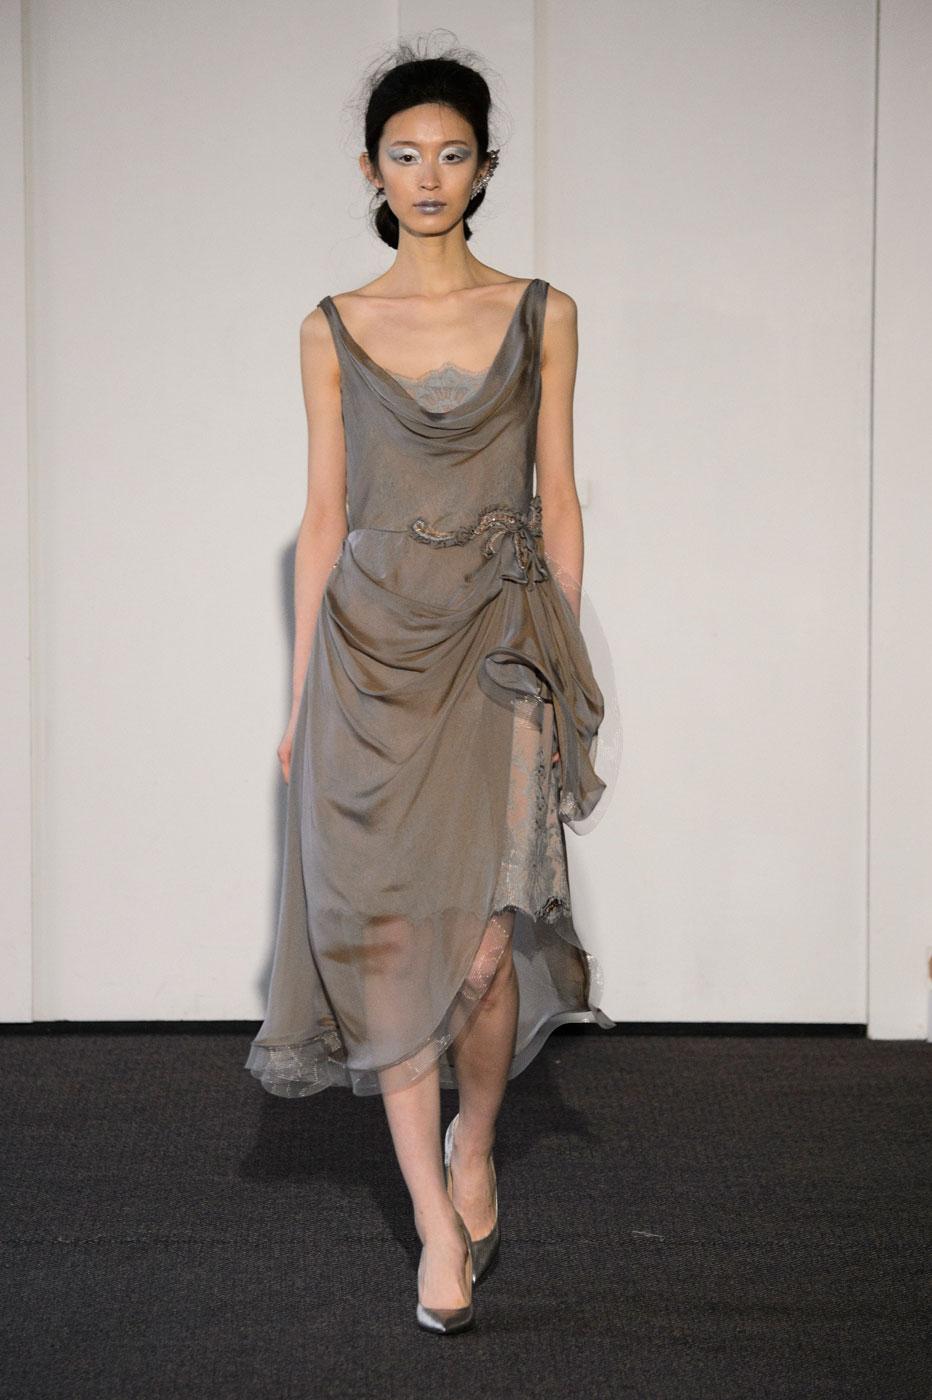 Busardi-fashion-runway-show-haute-couture-paris-spring-2015-the-impression-22